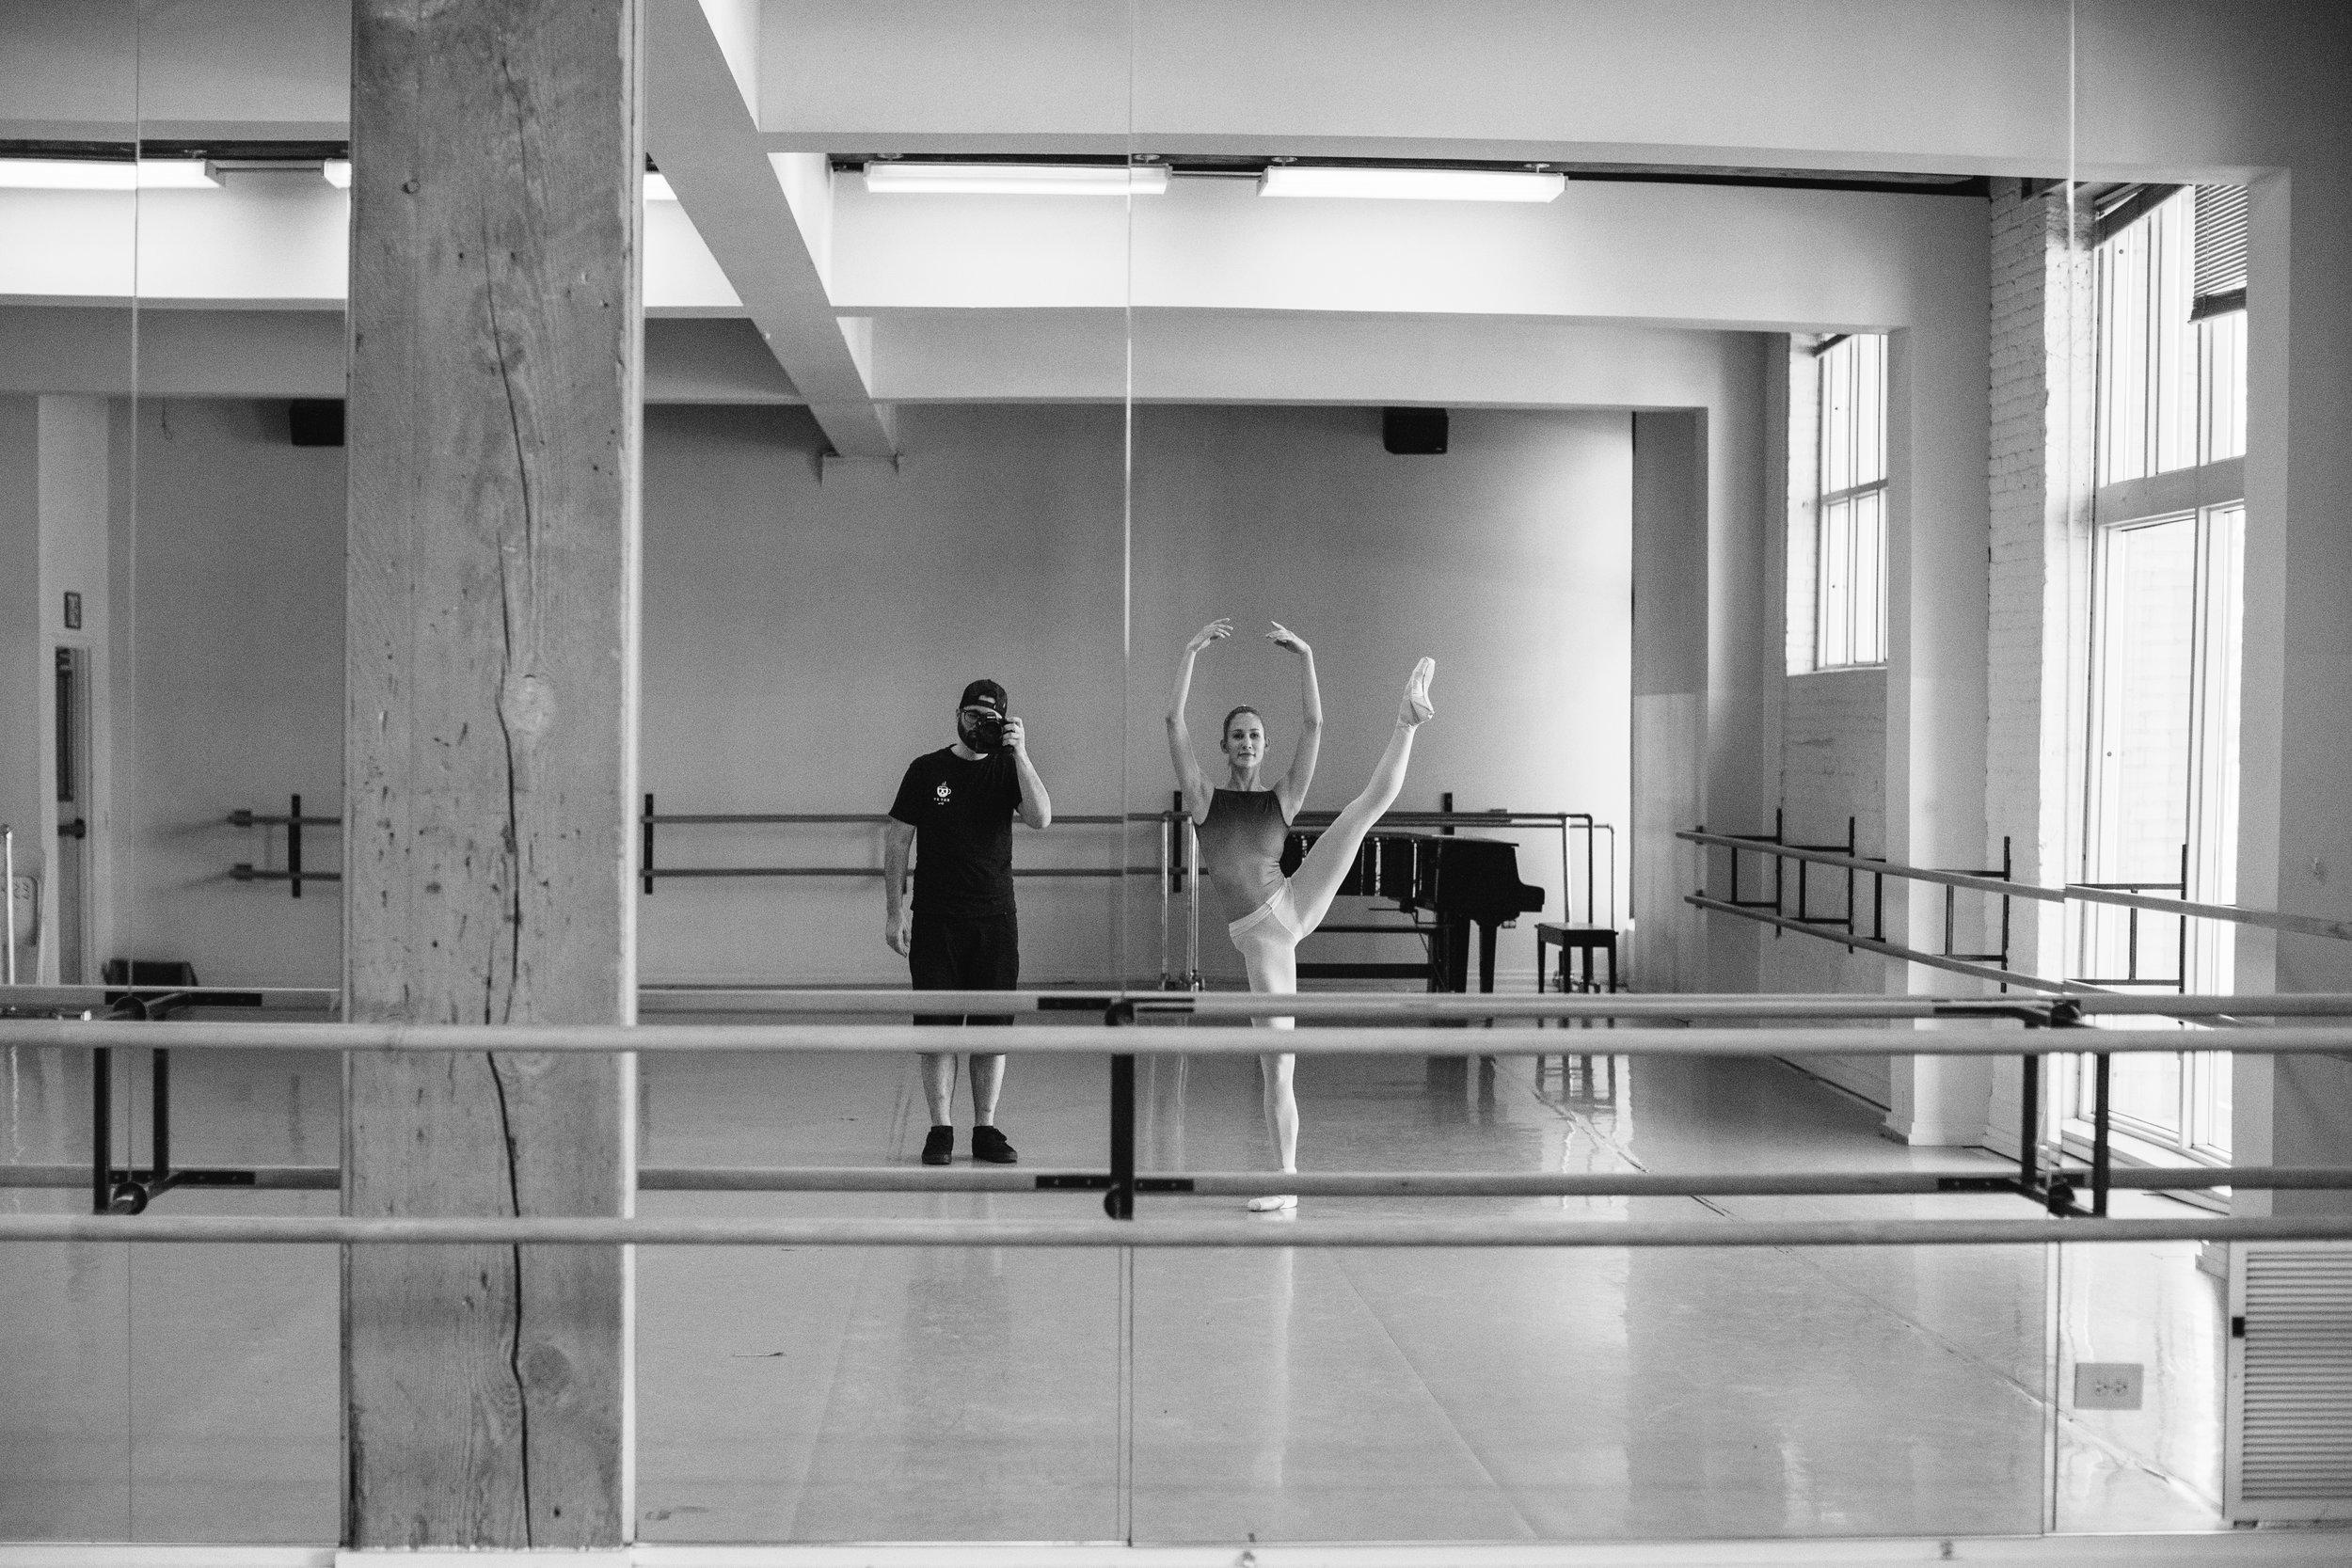 Jessica_Ballet-36.JPG